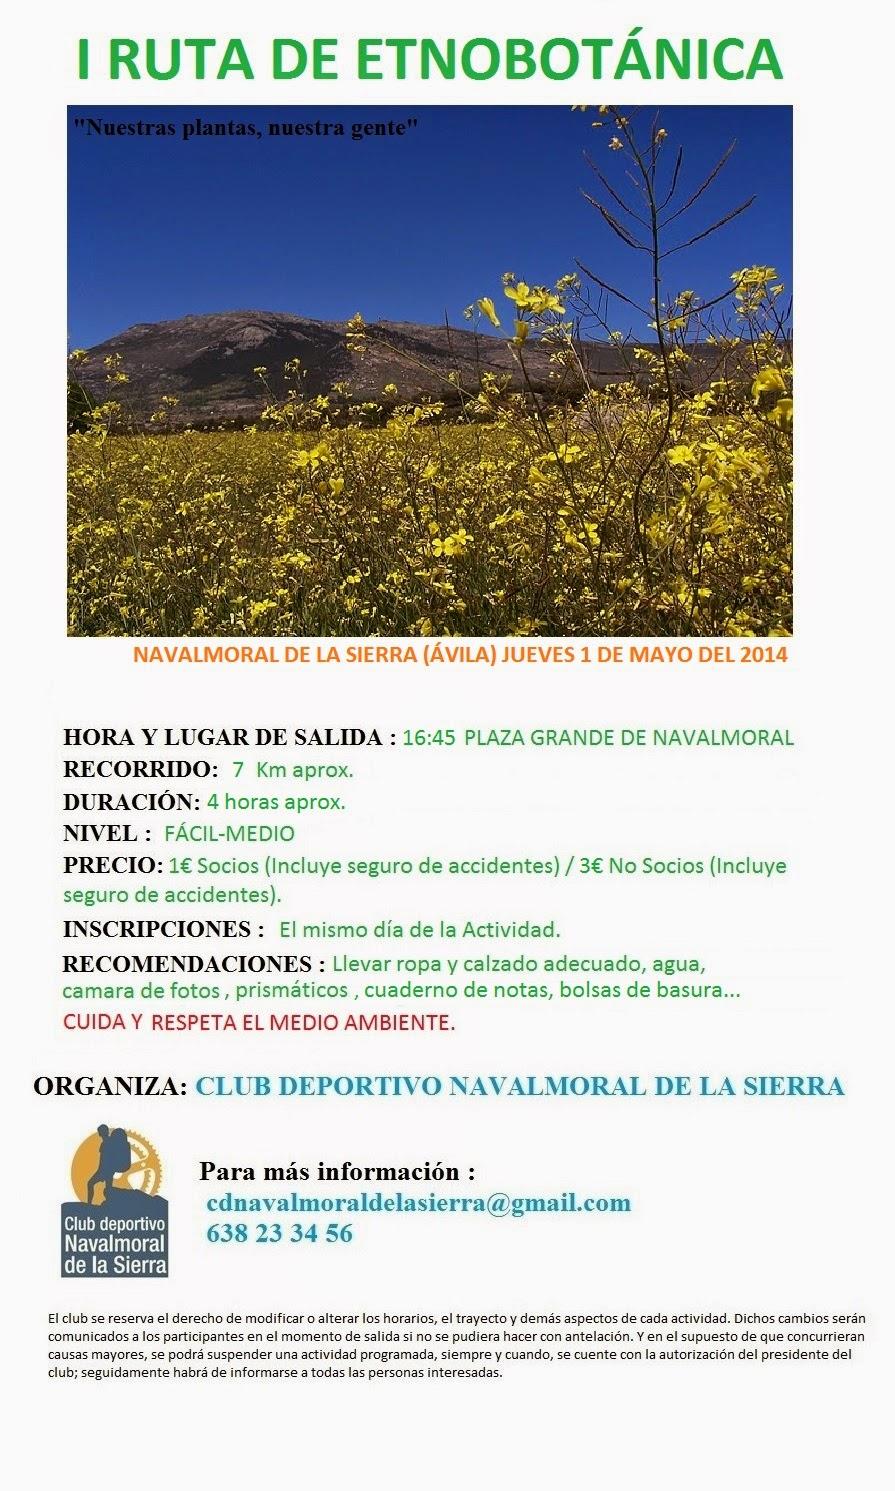 Plazanavaluenga paseo etnobot nico en navalmoral - Navalmoral de la sierra ...